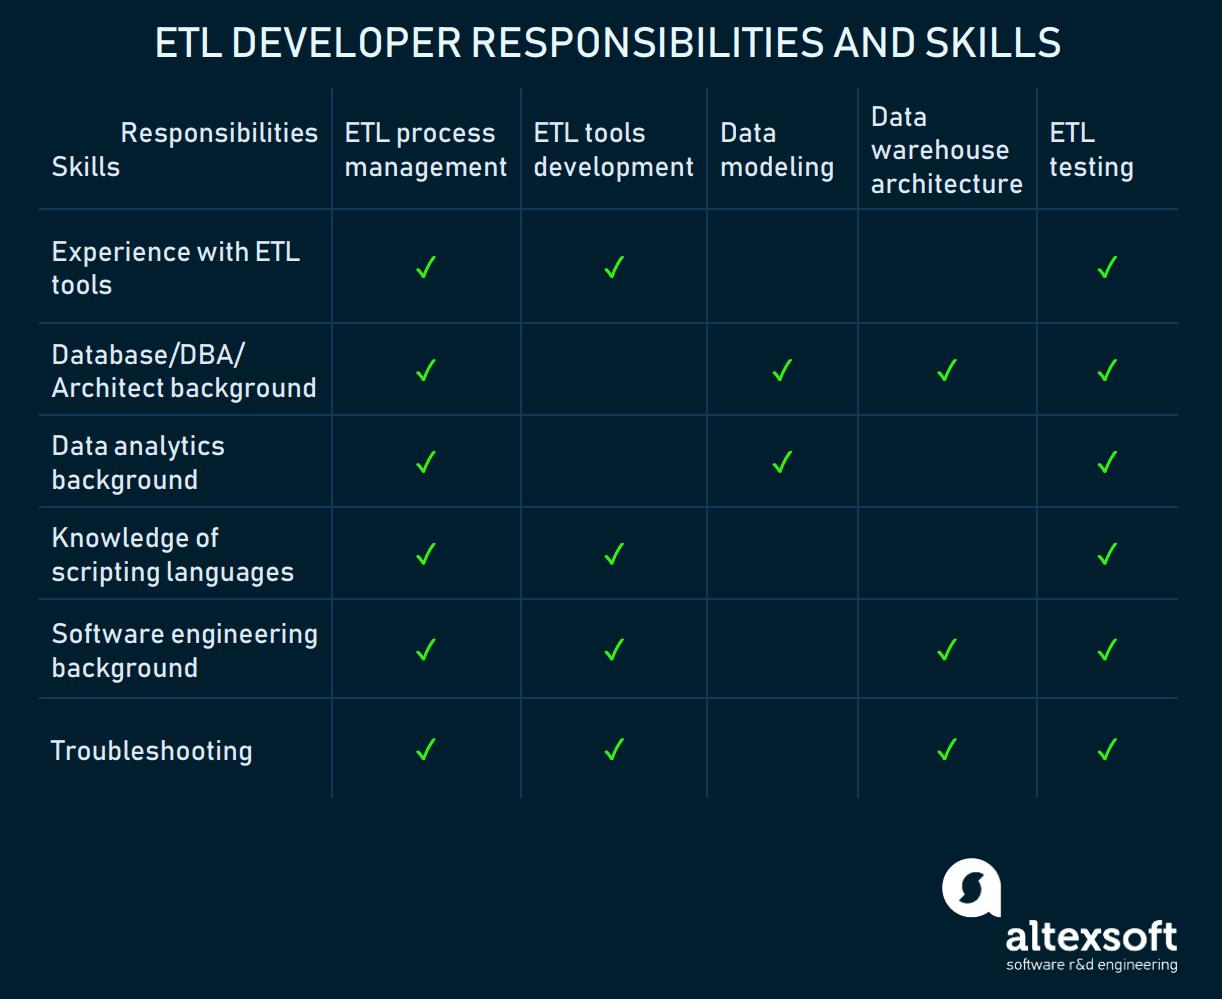 Table of ETL developer's responsibilities and skills